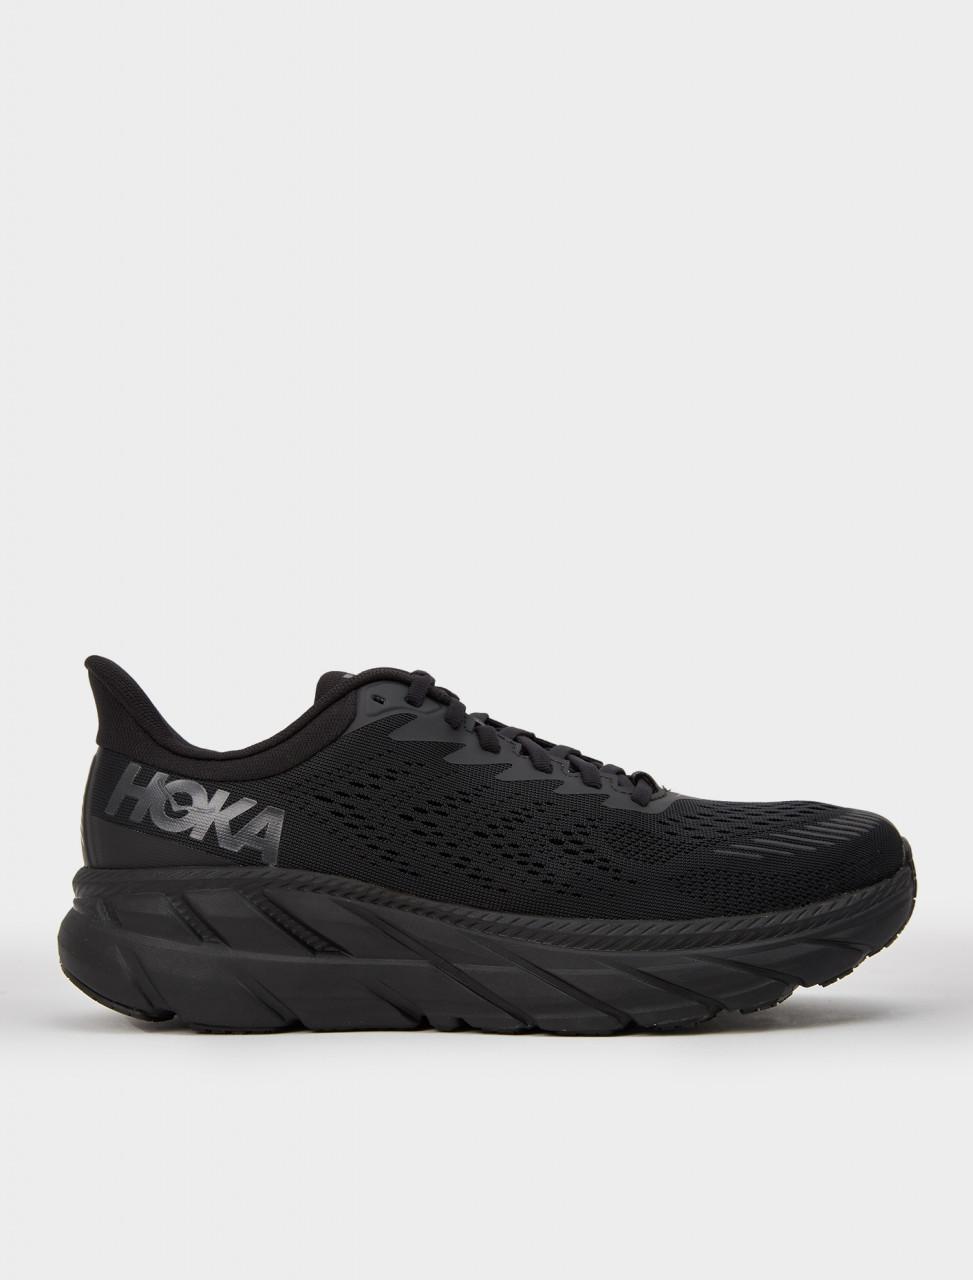 Hoka One One Clifton 7 Sneaker   Voo